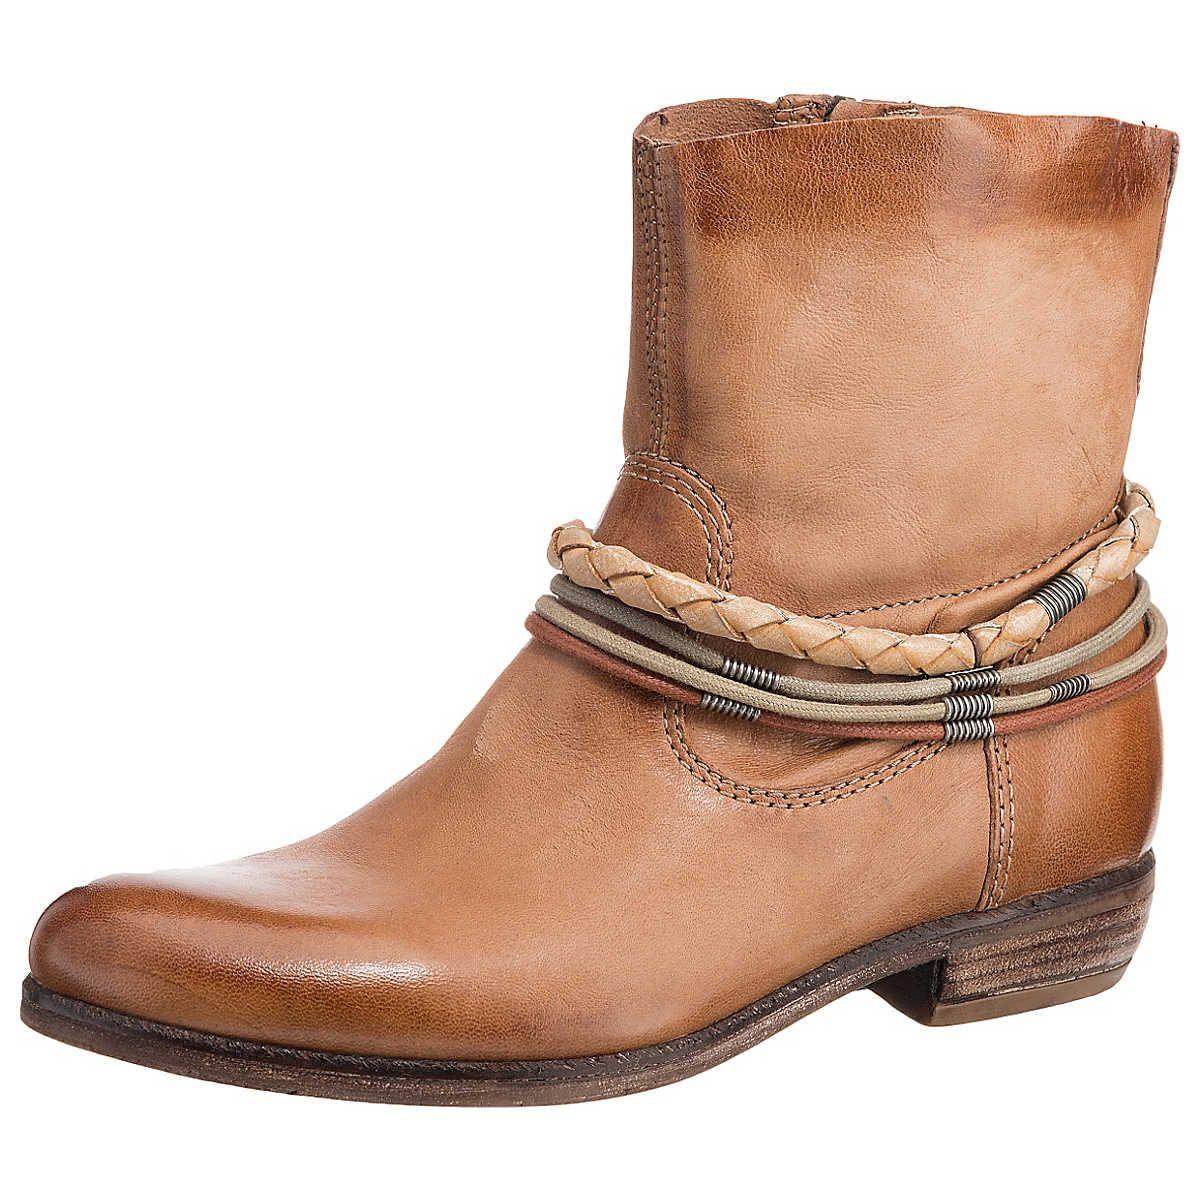 Mjus Boots Und StiefelettenHerbst Winter FashionShoes nwPOk80X